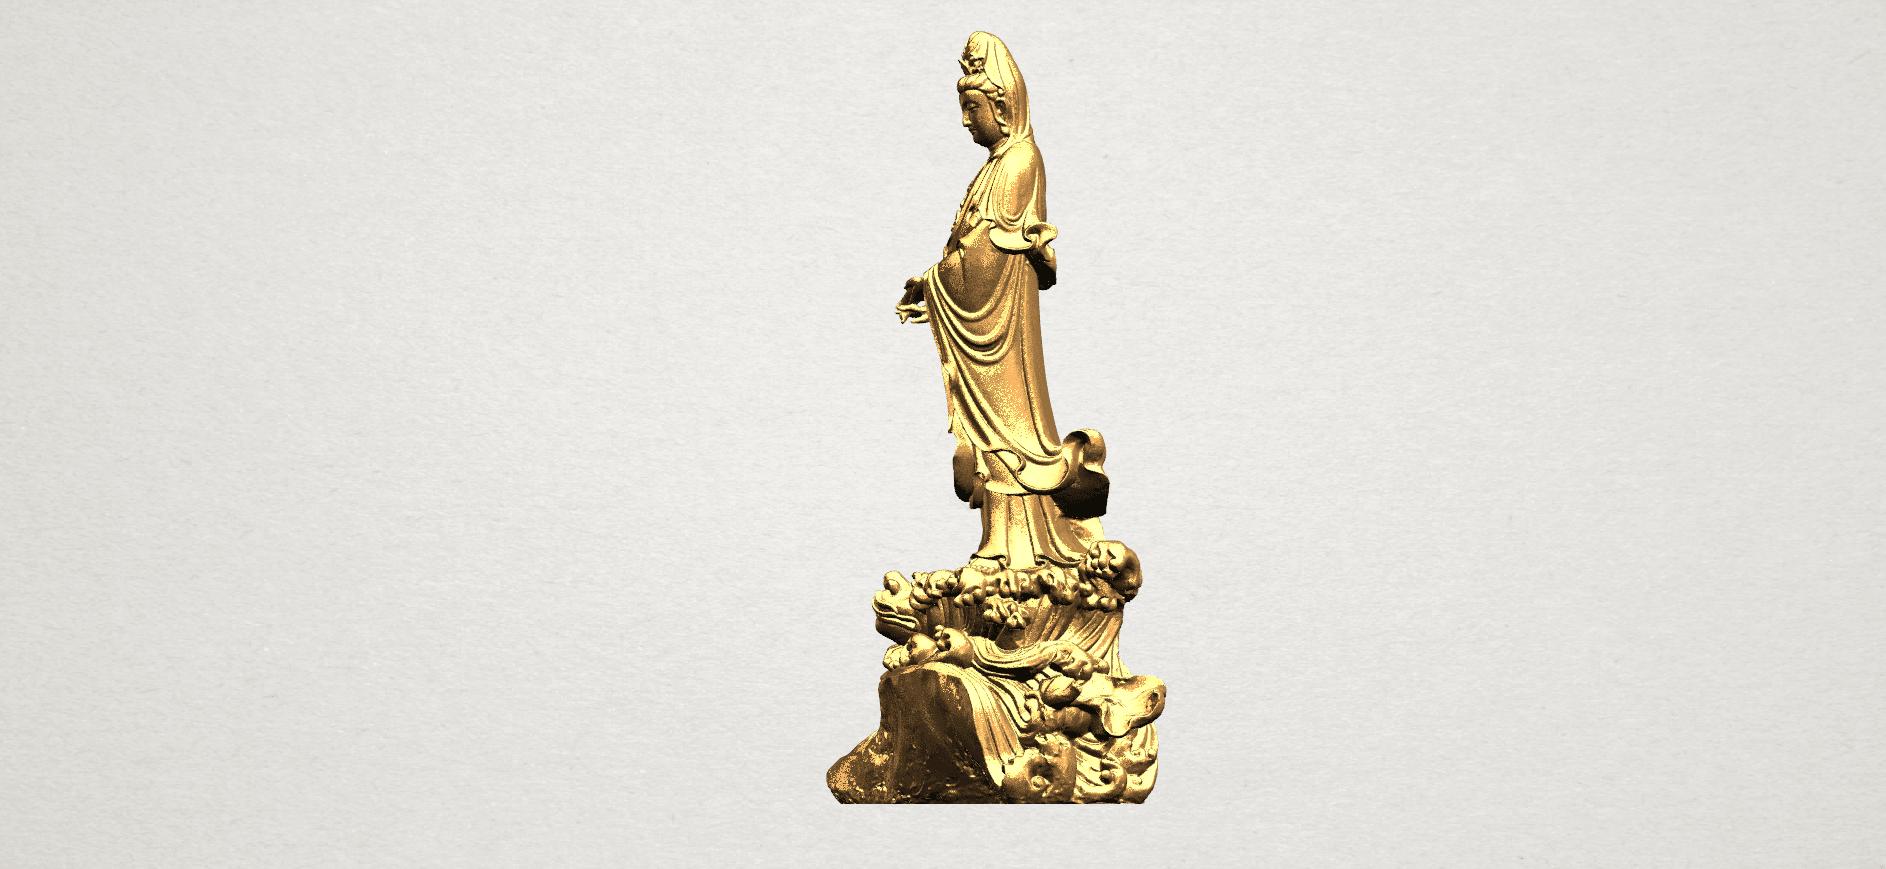 Avalokitesvara Buddha - Standing (ii) A03.png Download free STL file Avalokitesvara Bodhisattva - Standing 02 • Design to 3D print, GeorgesNikkei